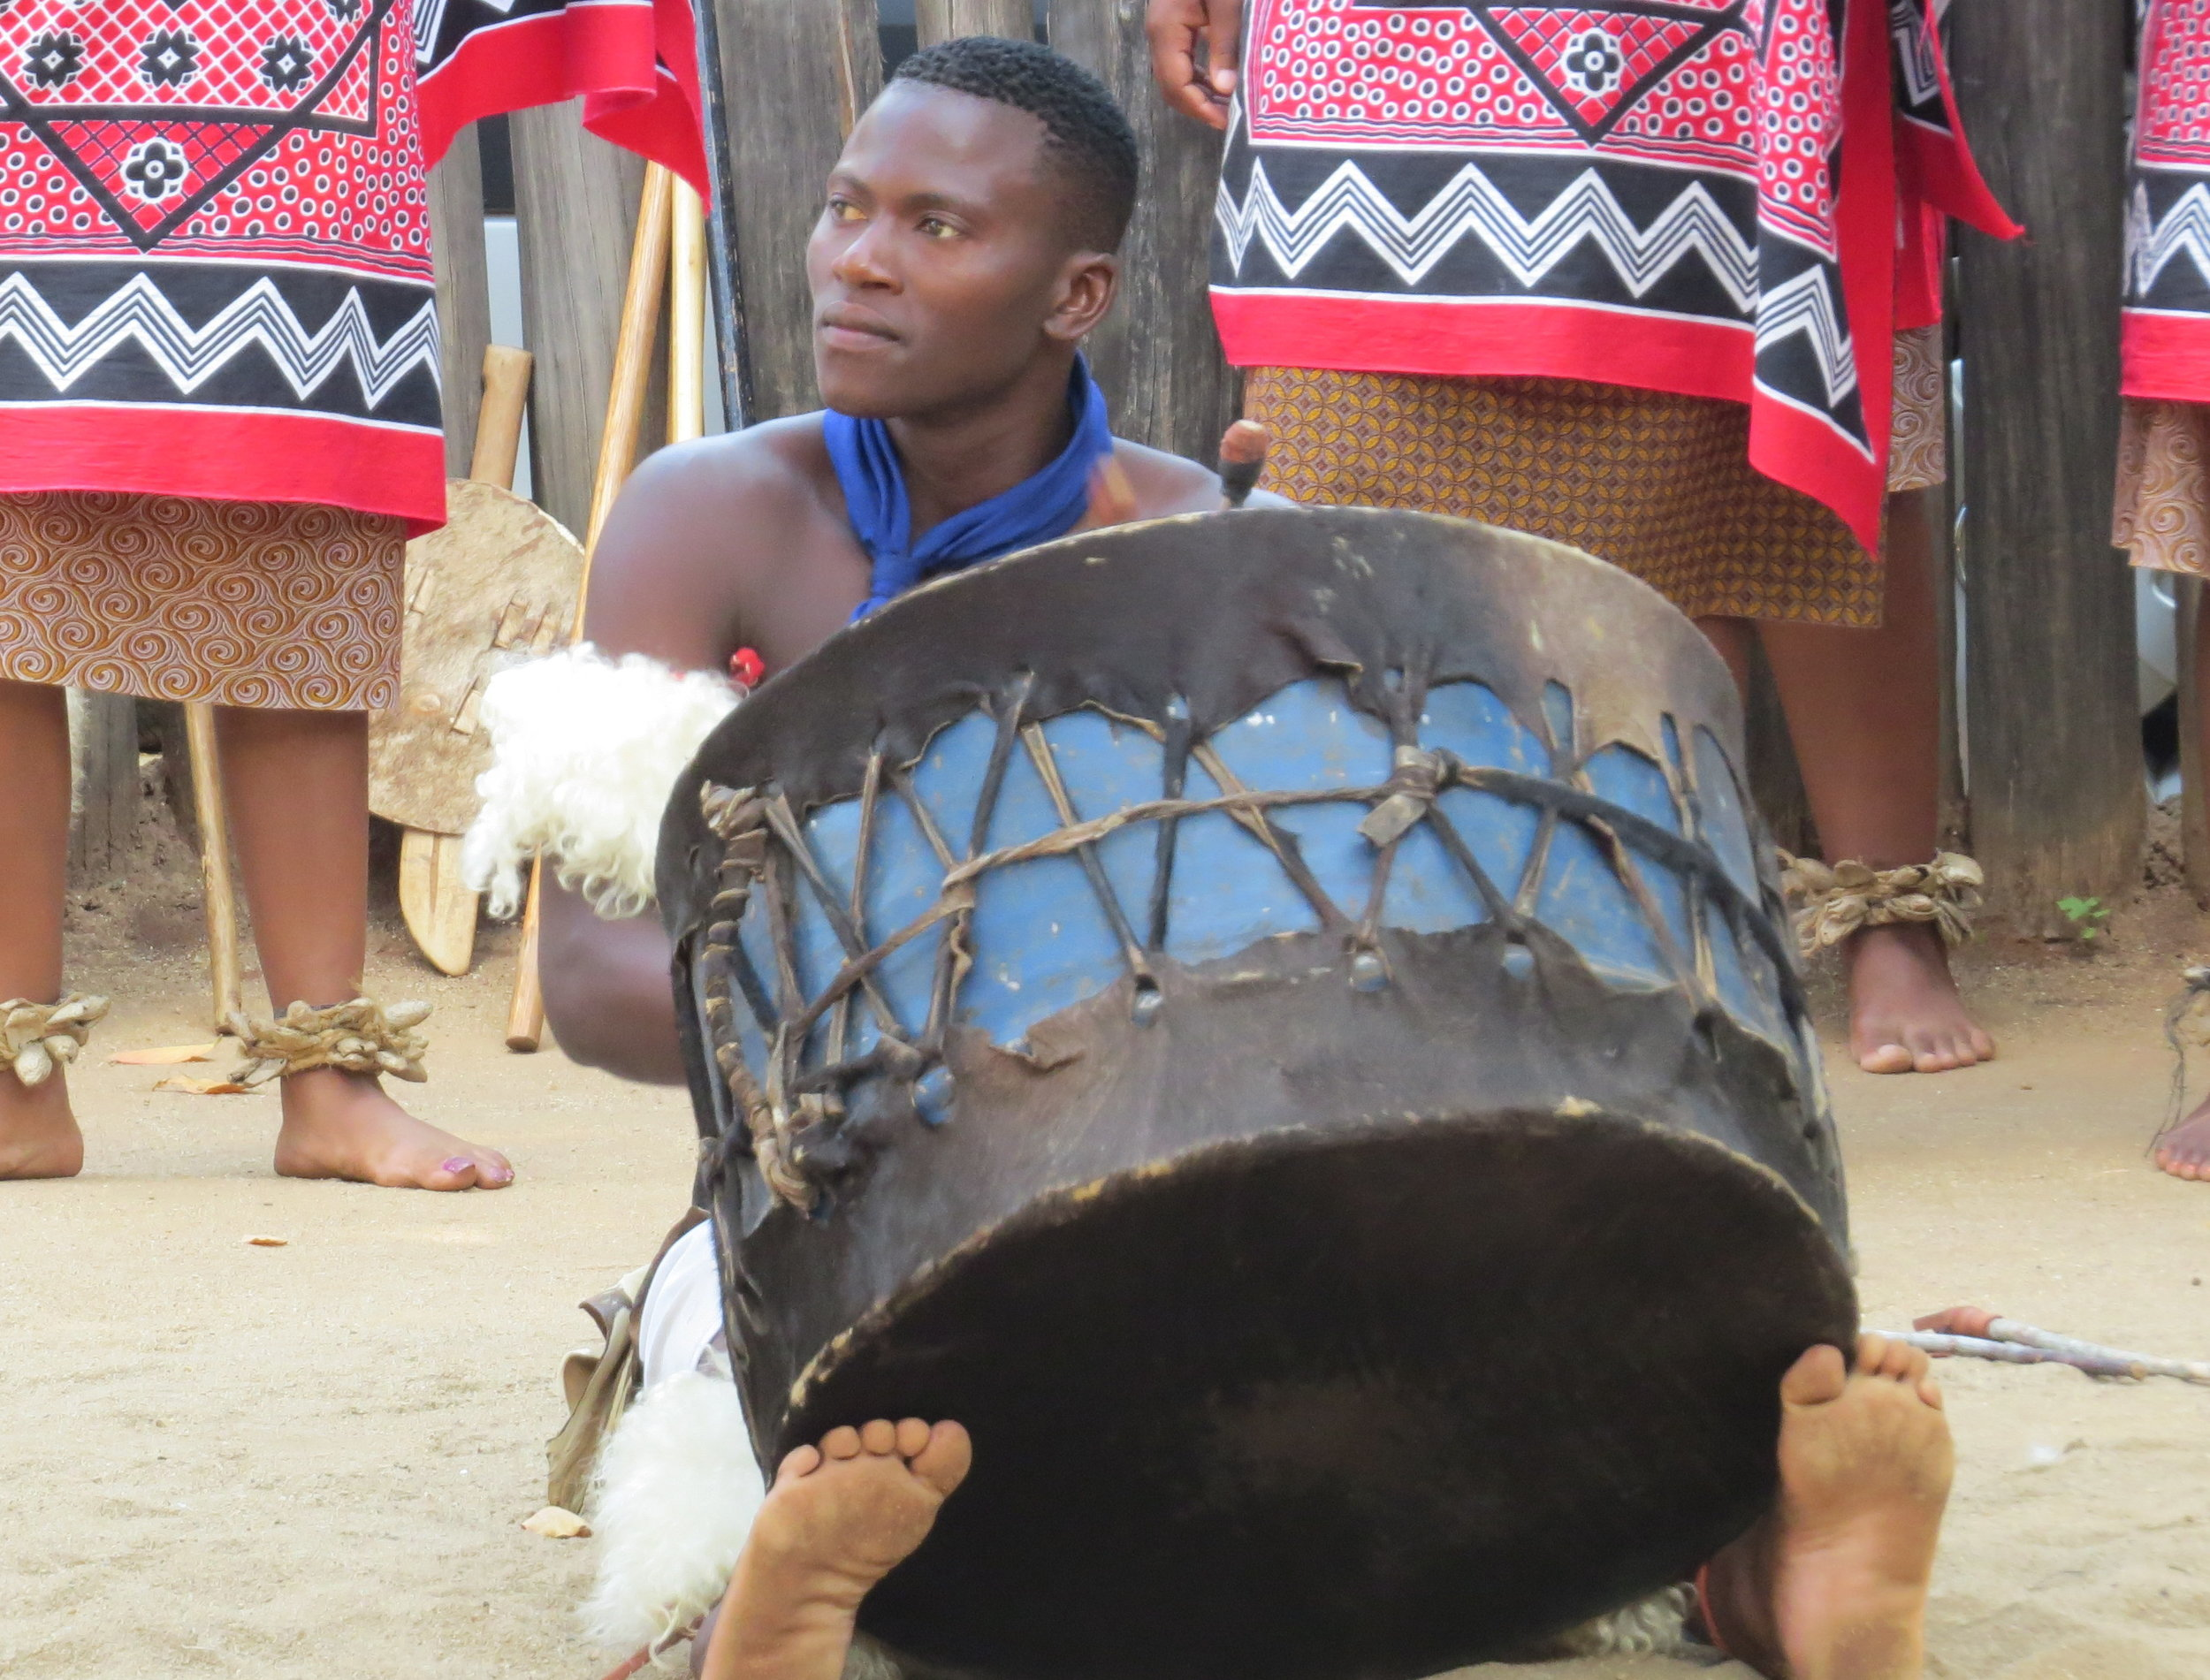 Swazi drummer kept the beat